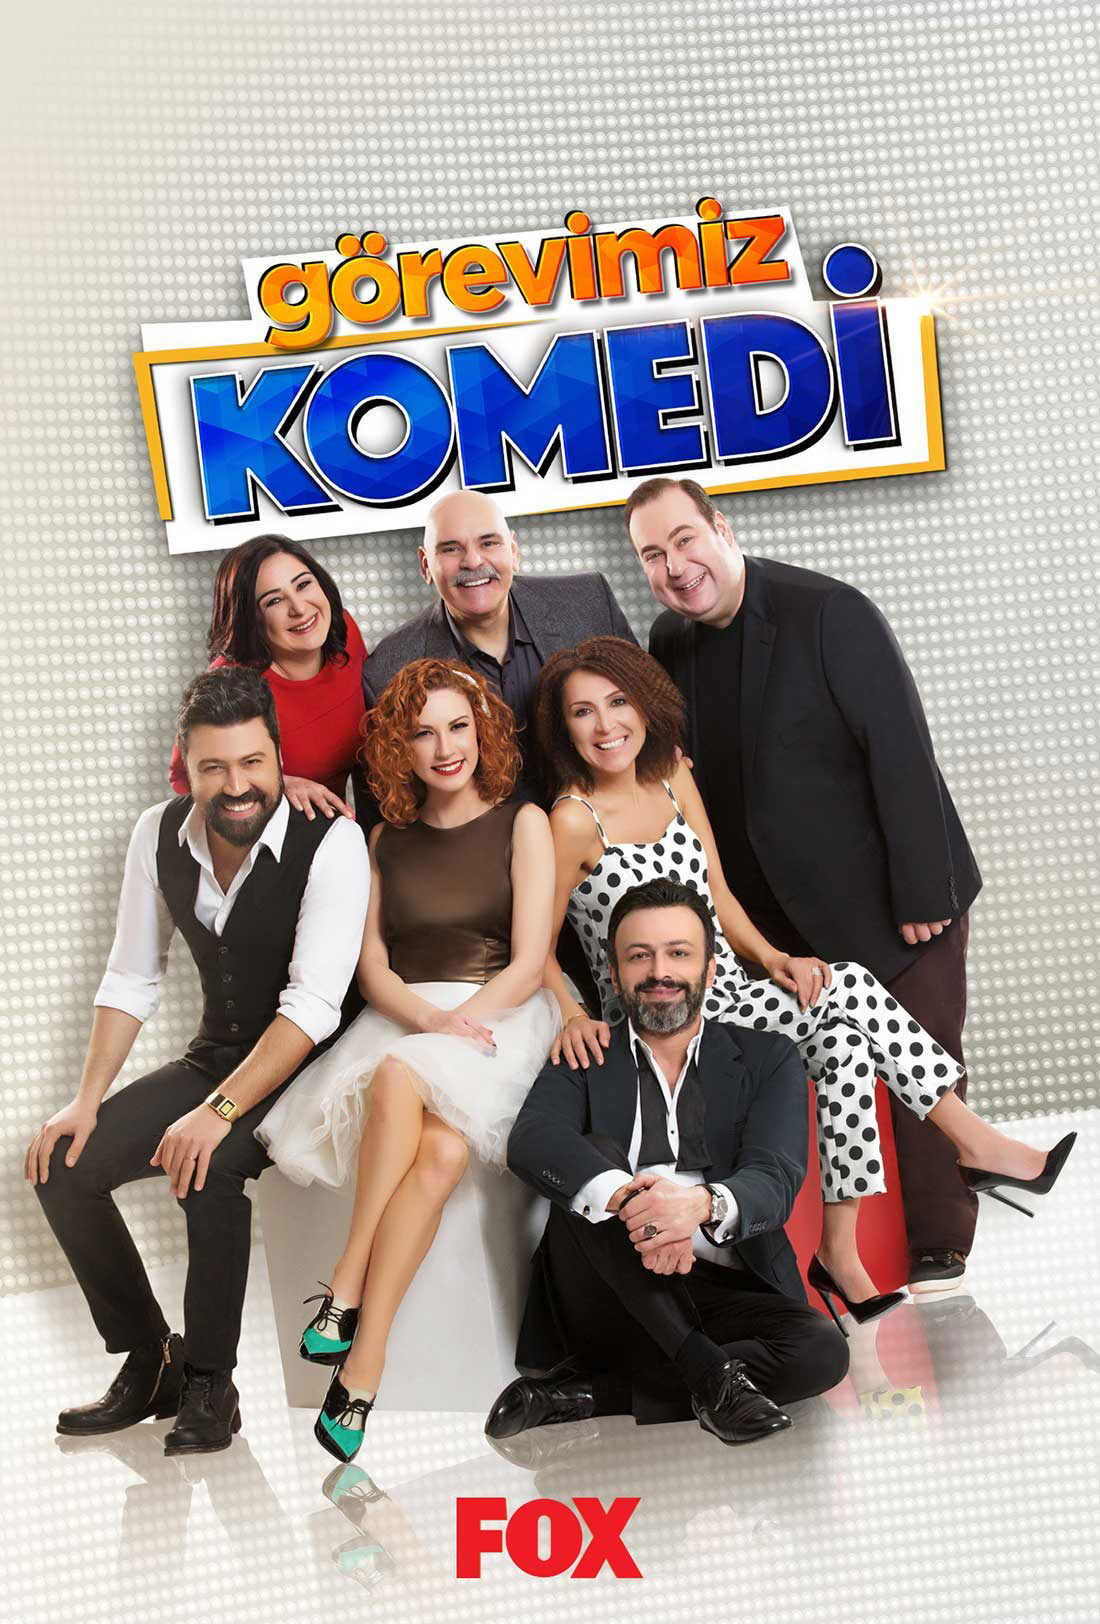 gorevimiz-komedi-01